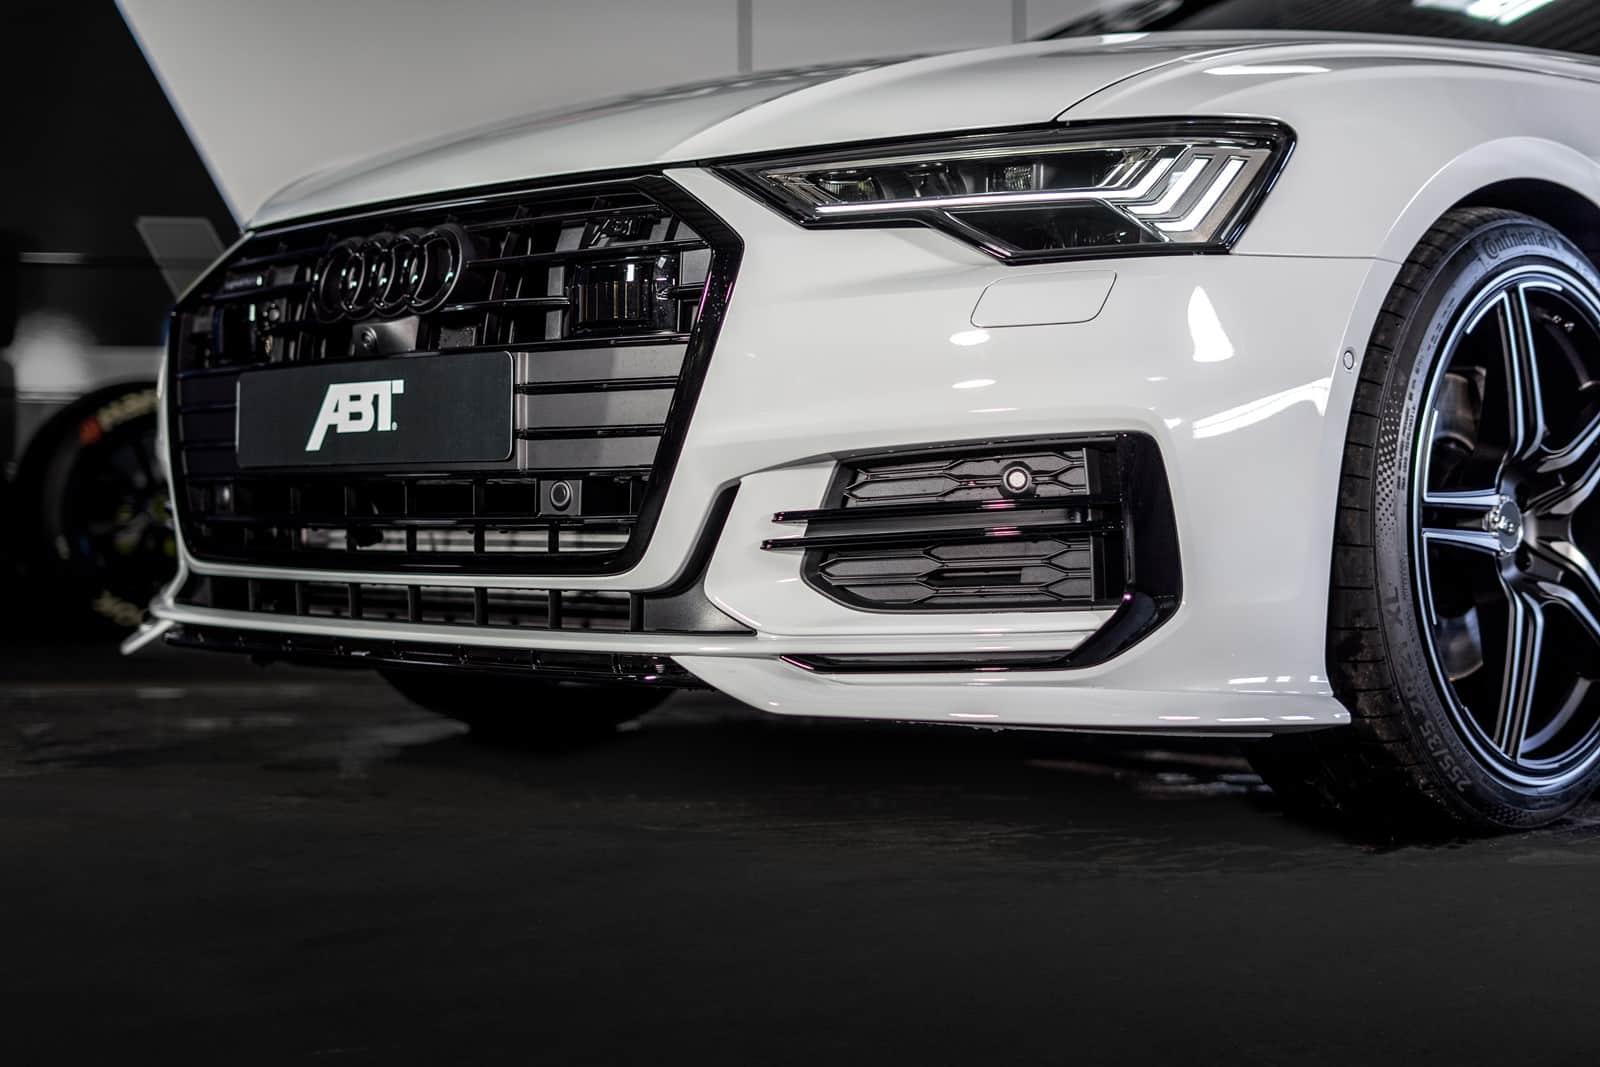 Audi-A6-Avant-ABT-aero-package-5.jpg